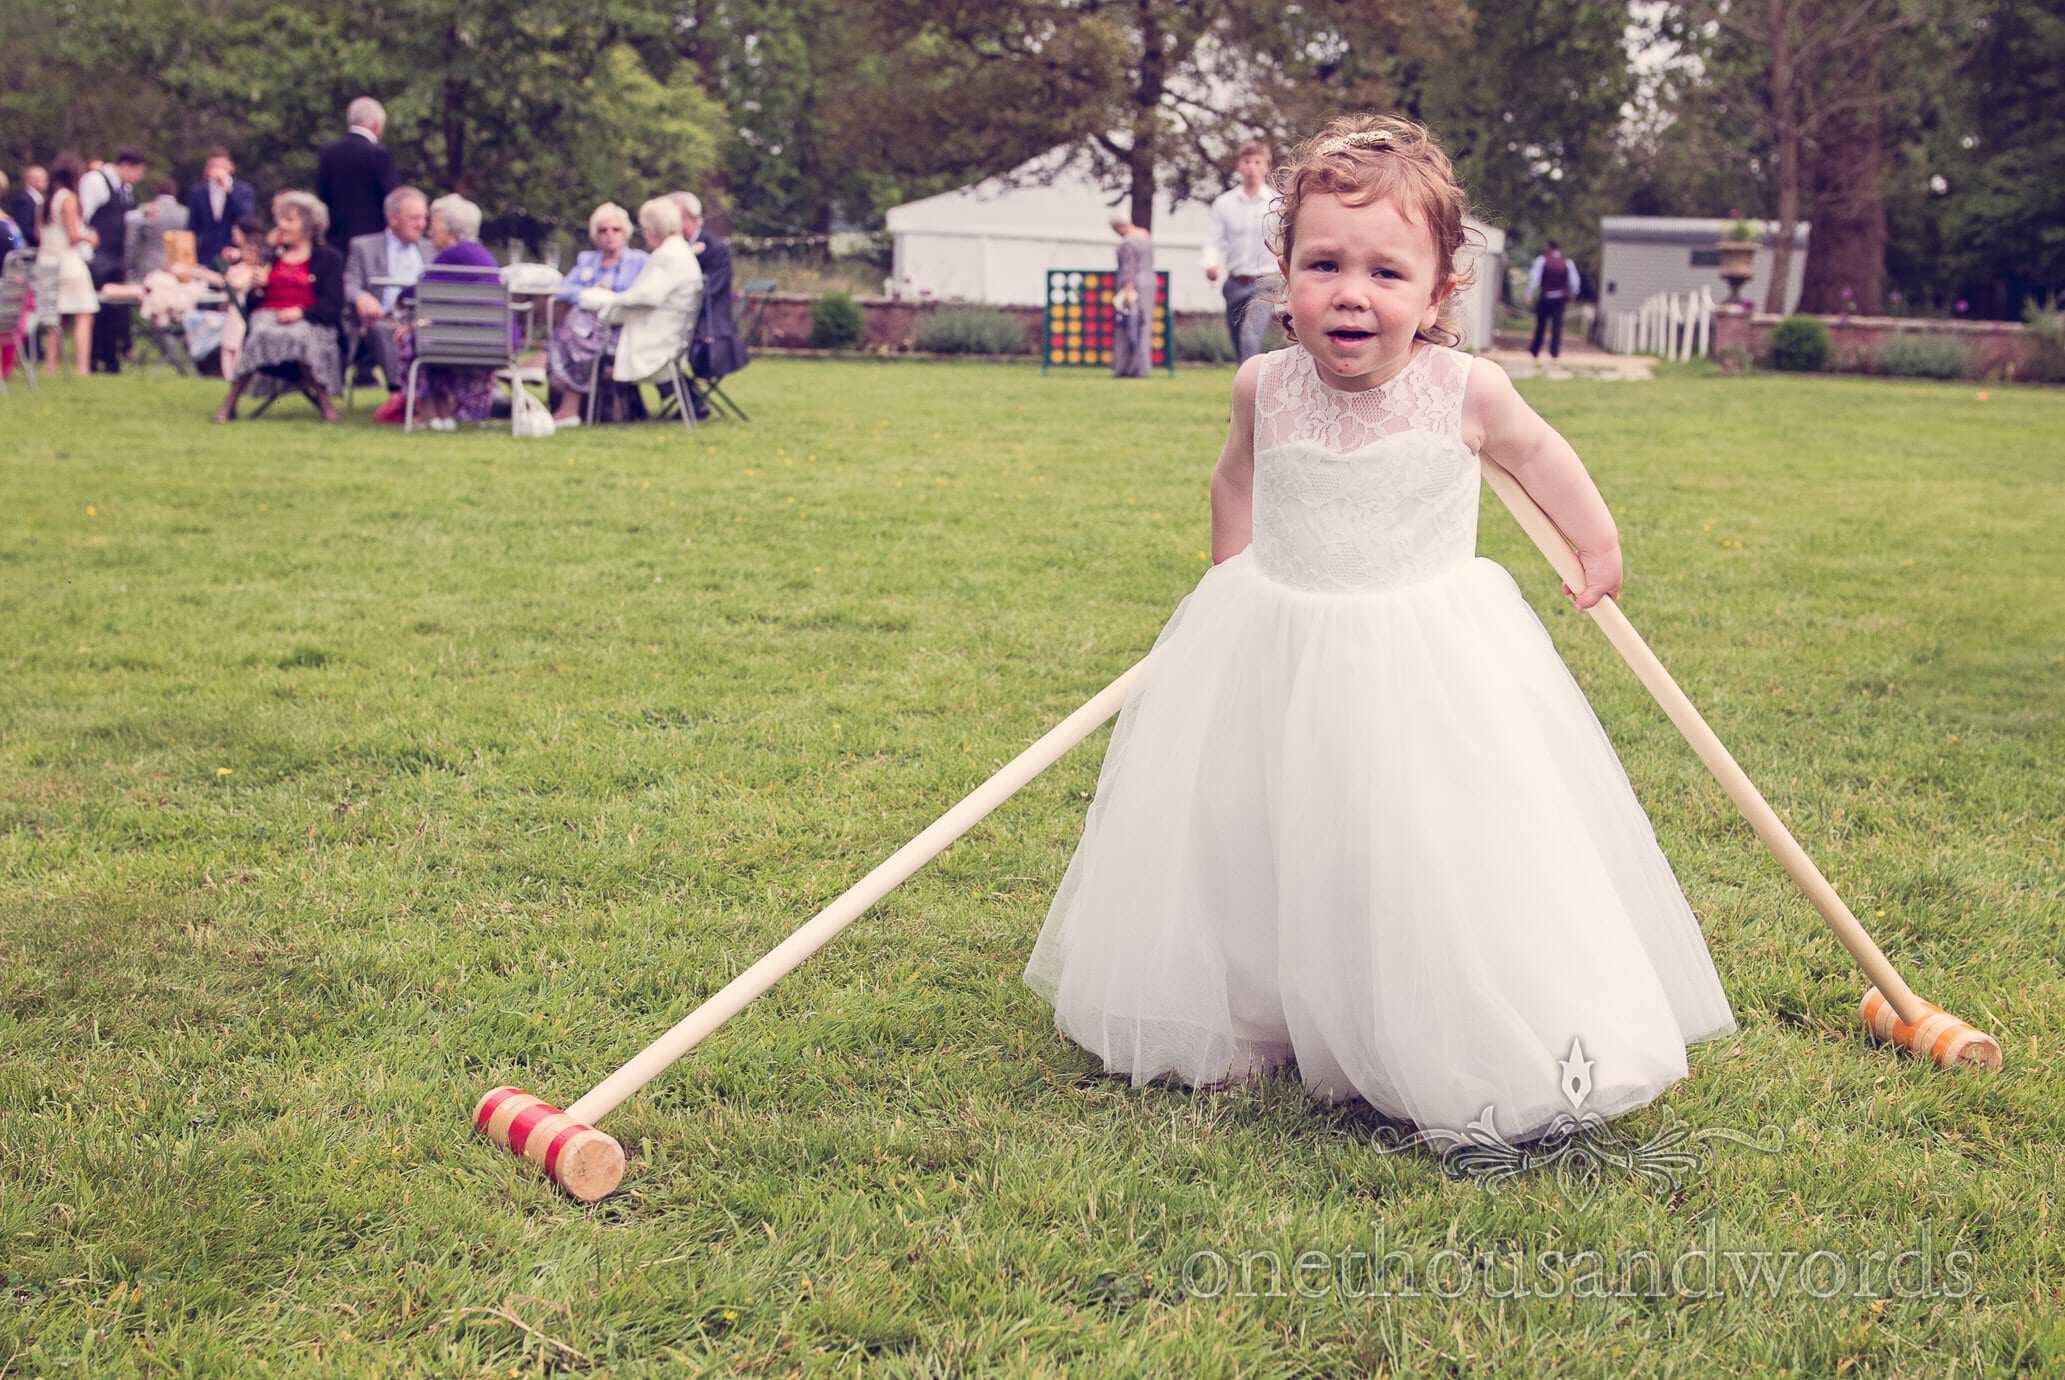 Flower girls with croquet mallets and garden games at Deans Court wedding